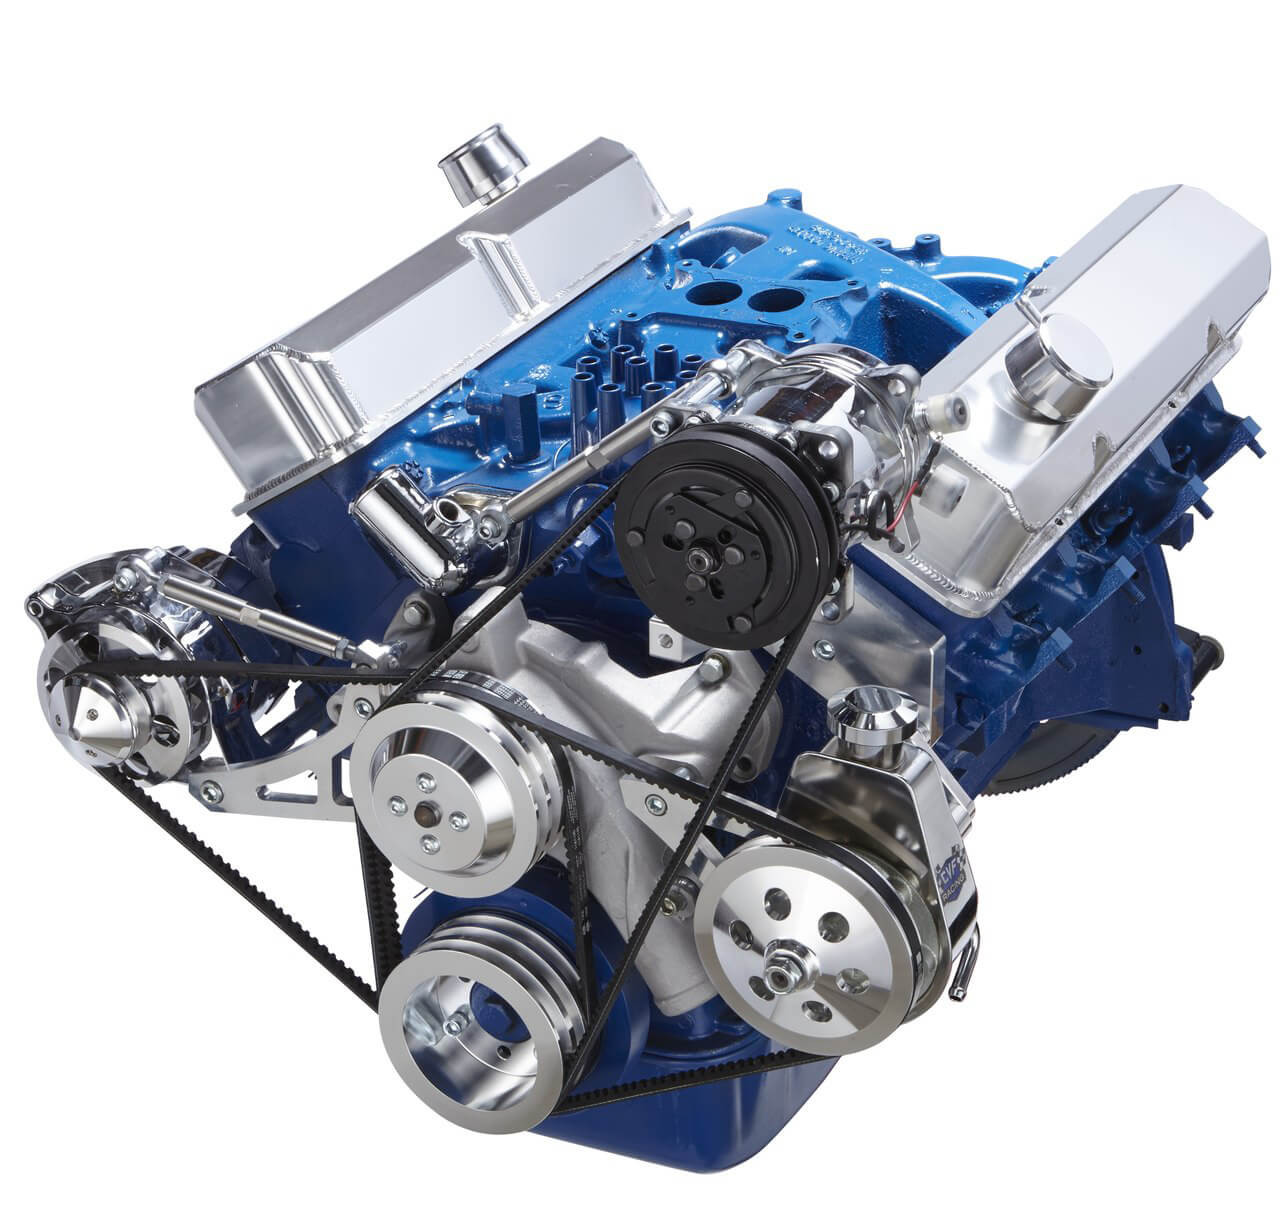 small resolution of fe 390 engine diagrams on diagram data schemaford 390 fe engine v belt pulley system sanden